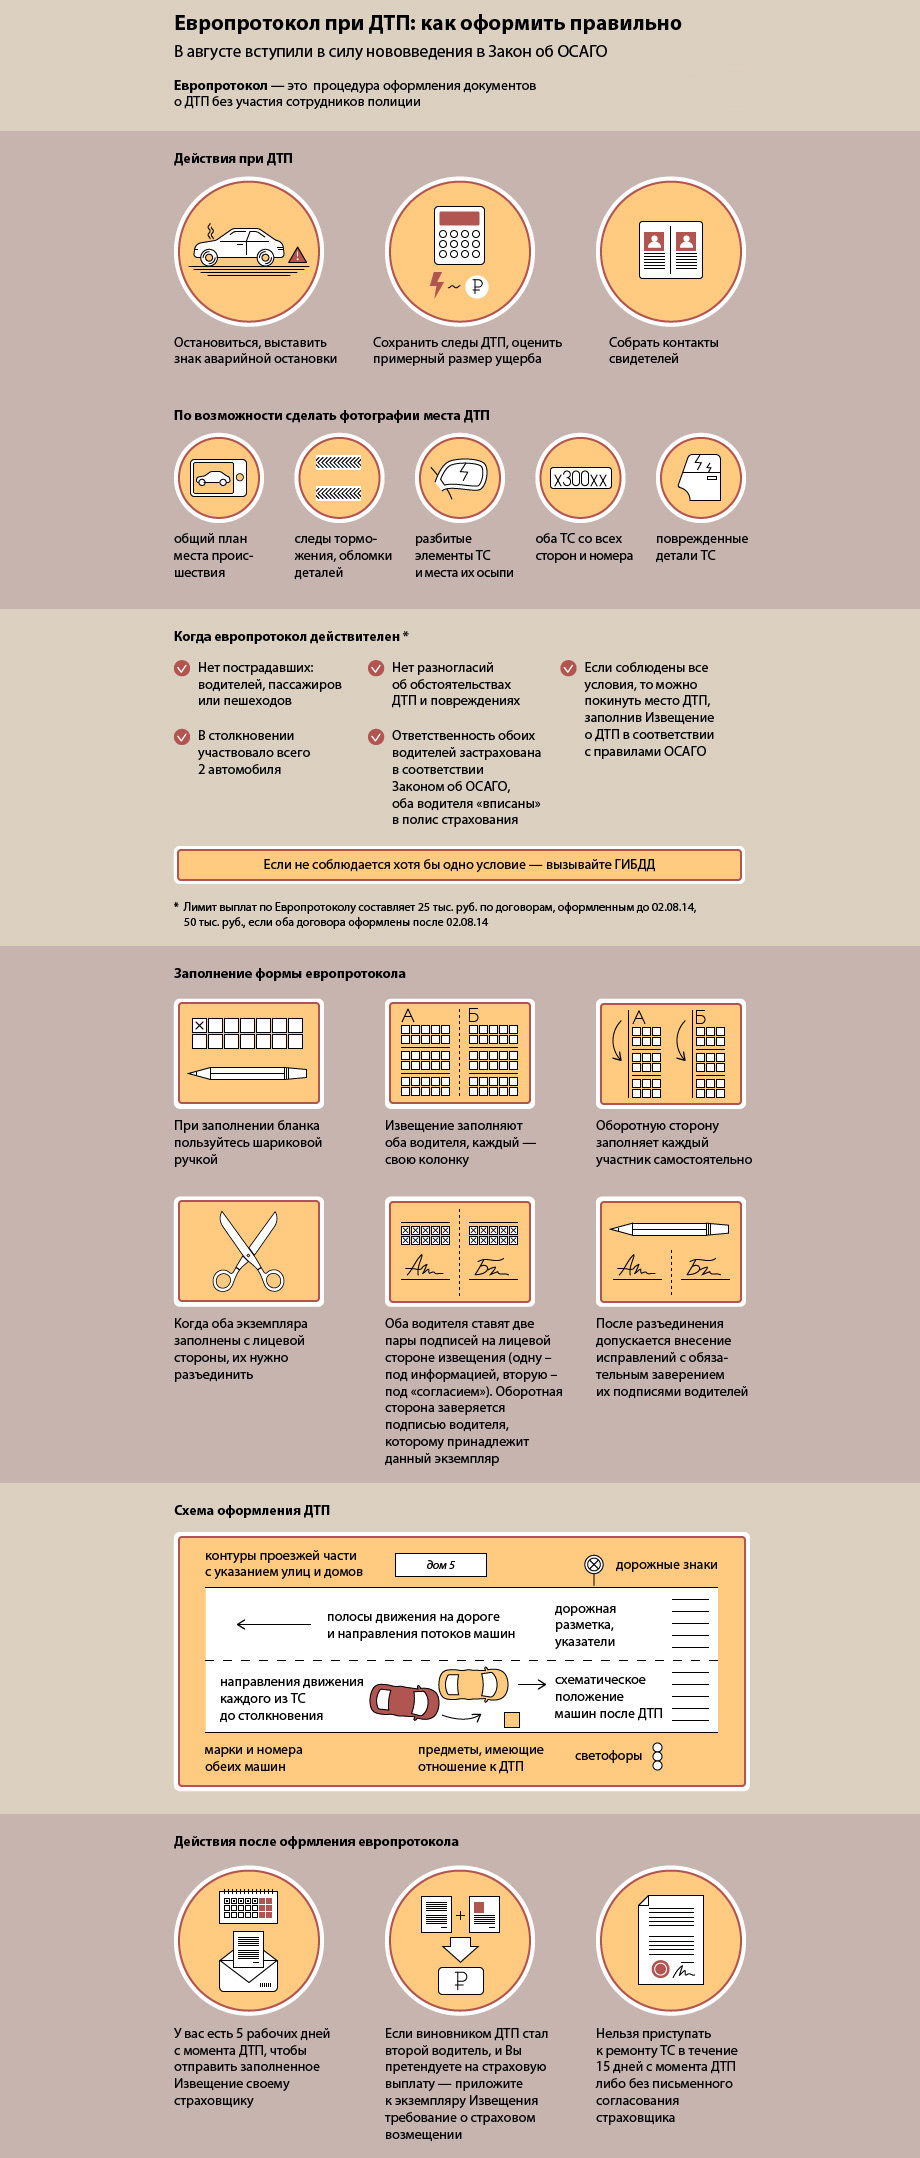 оформление европротокола при дтп образец